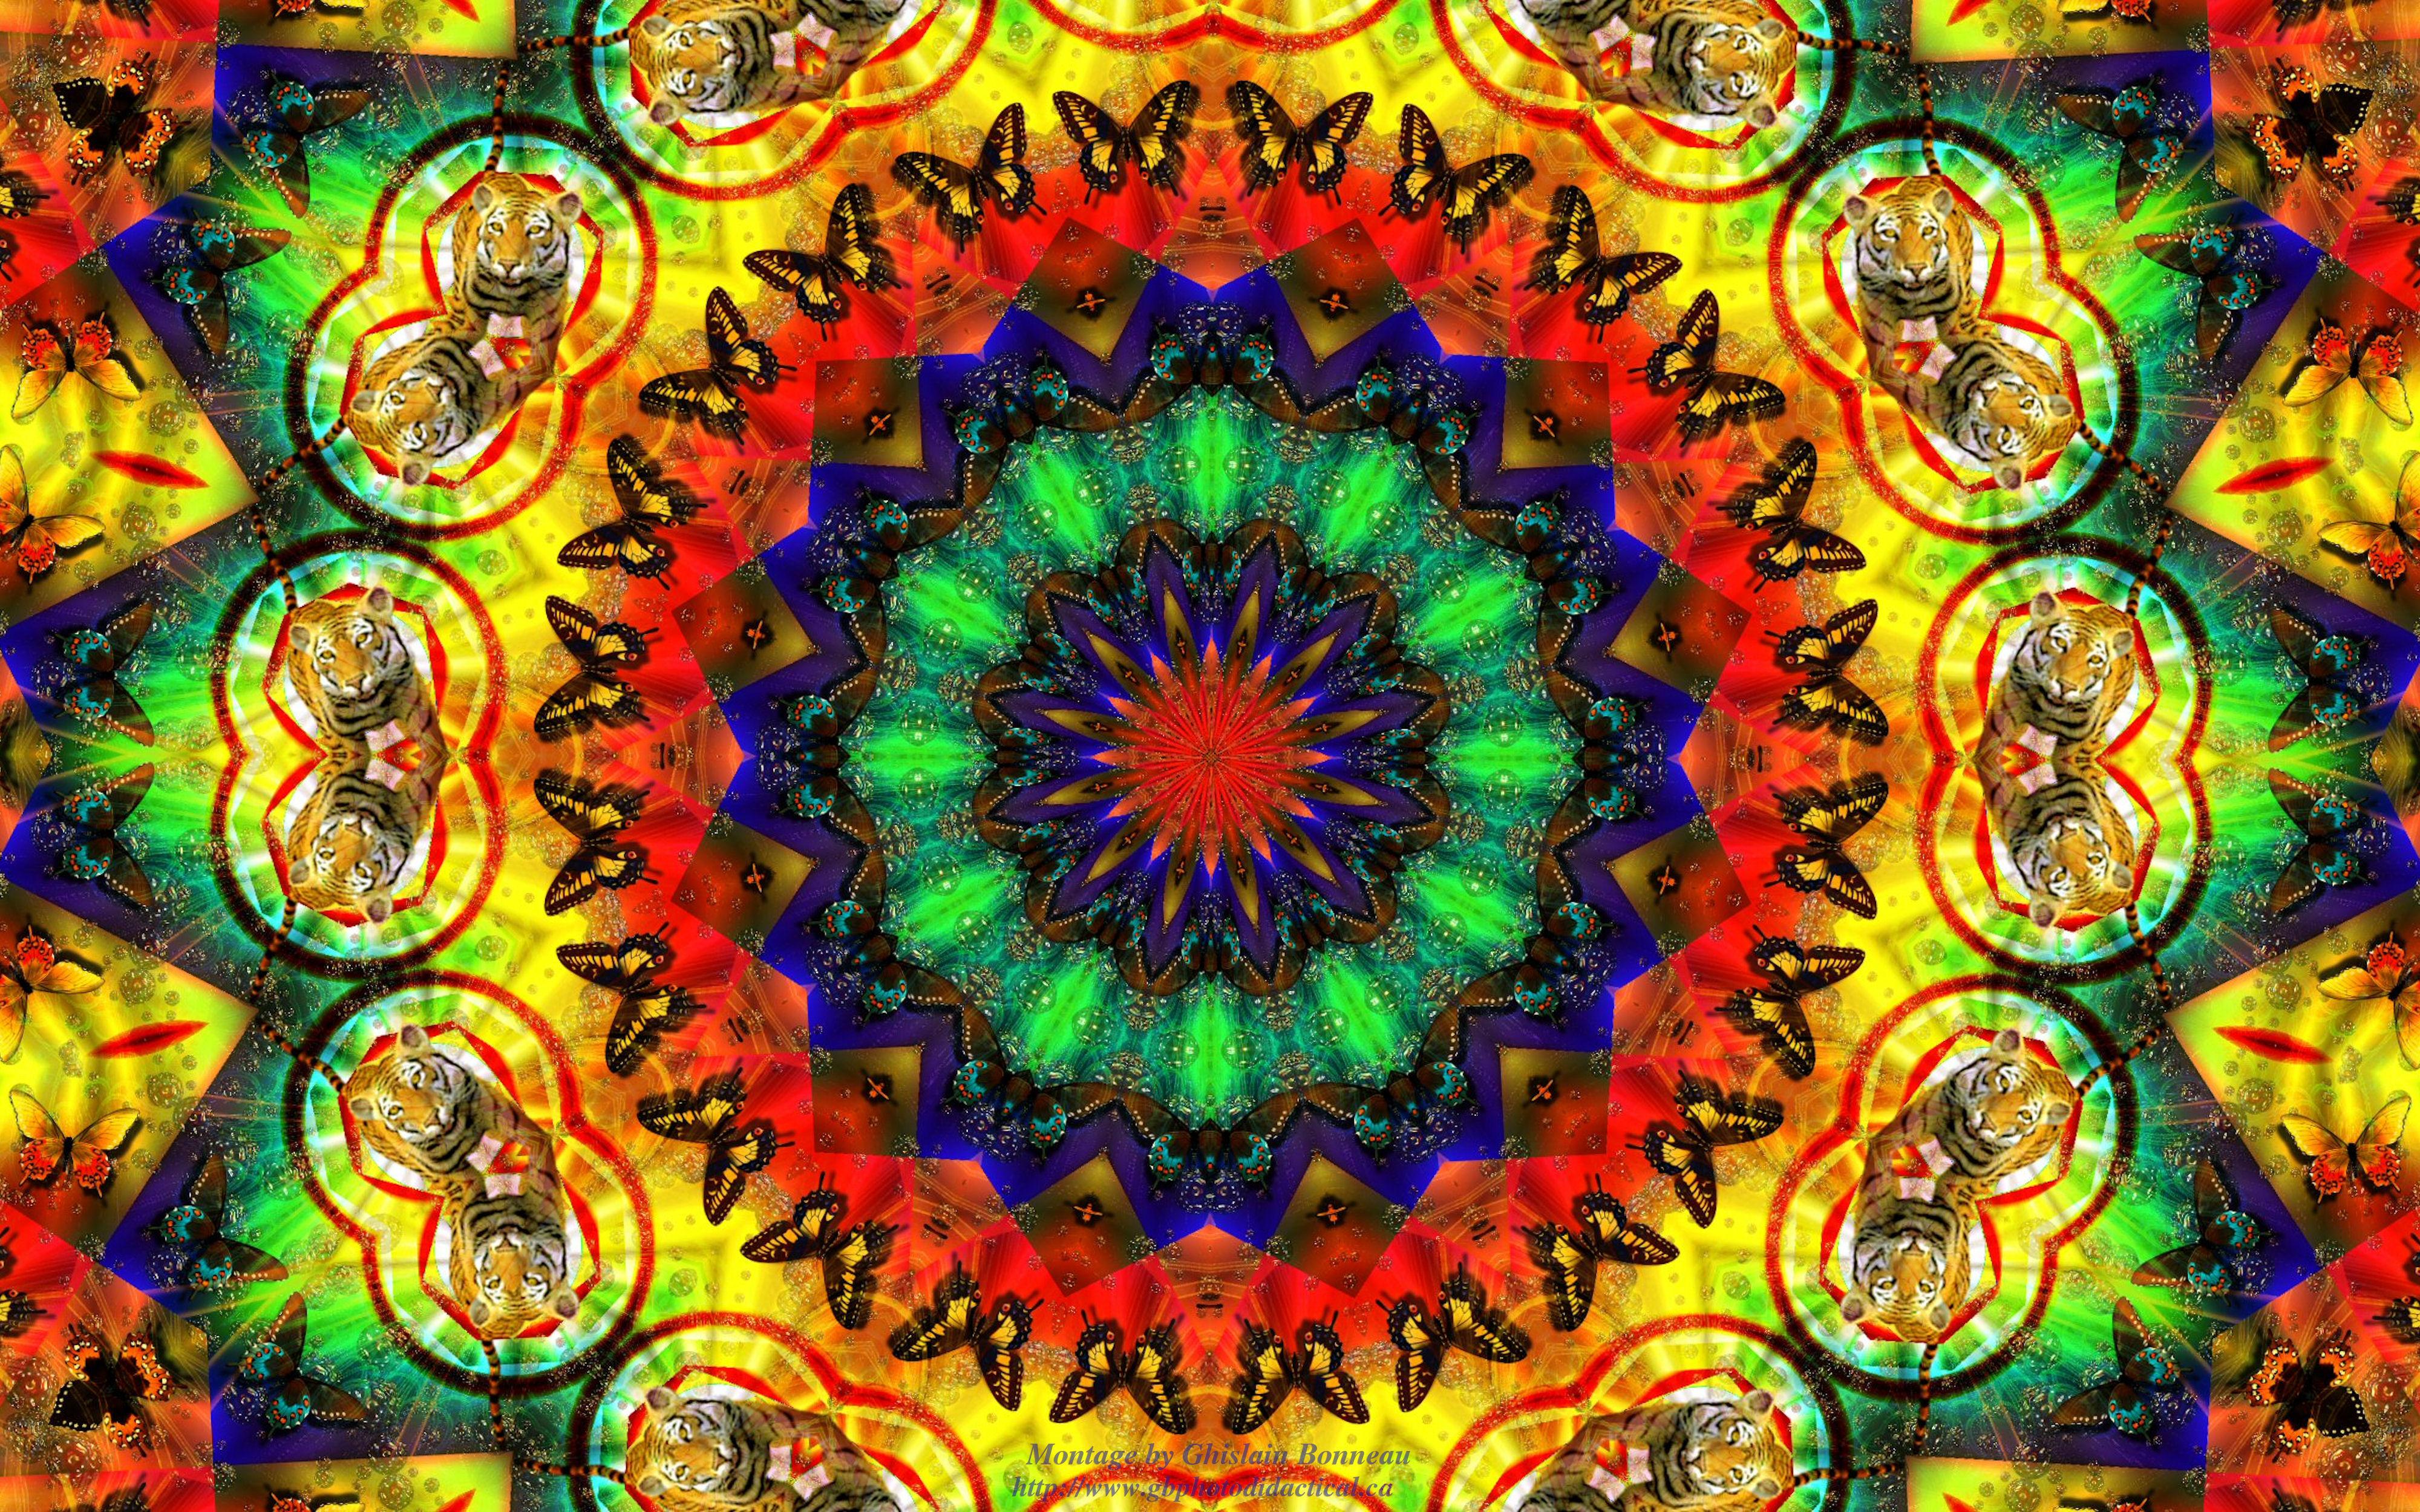 Hippie psychedelic wallpaper 4000x2500